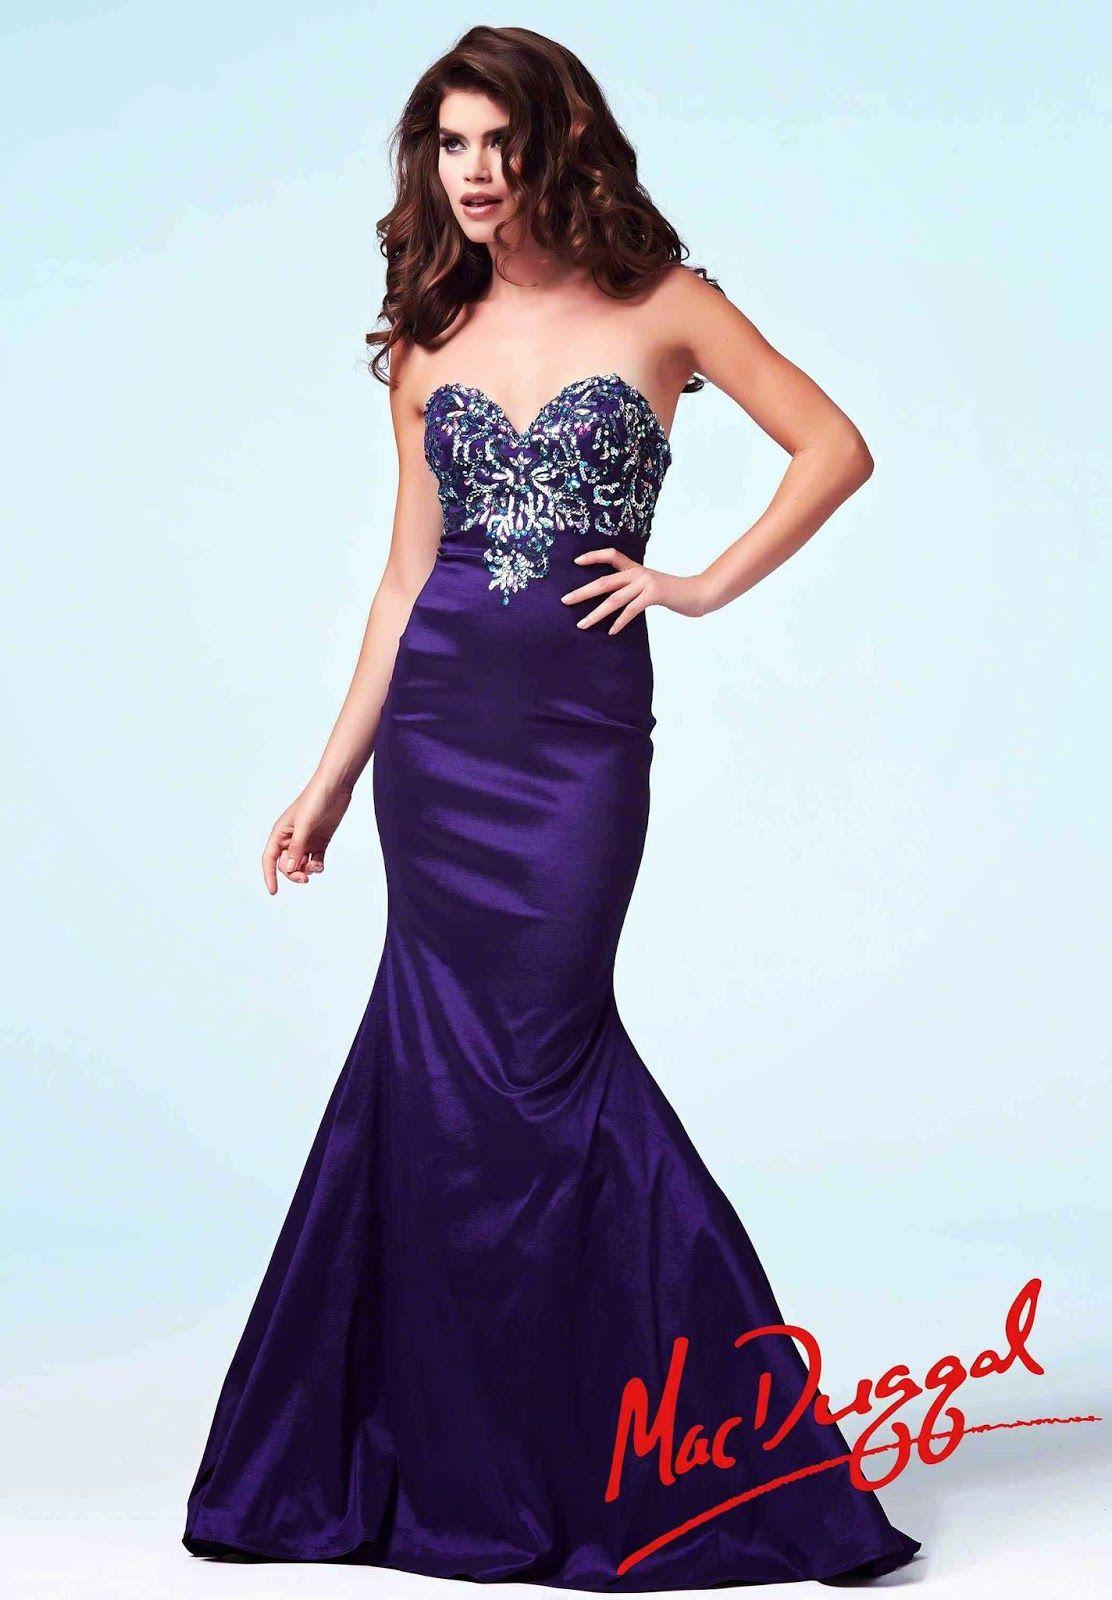 Pin de TheSeaPrincess en Dresses   Pinterest   Vestidos para fiestas ...